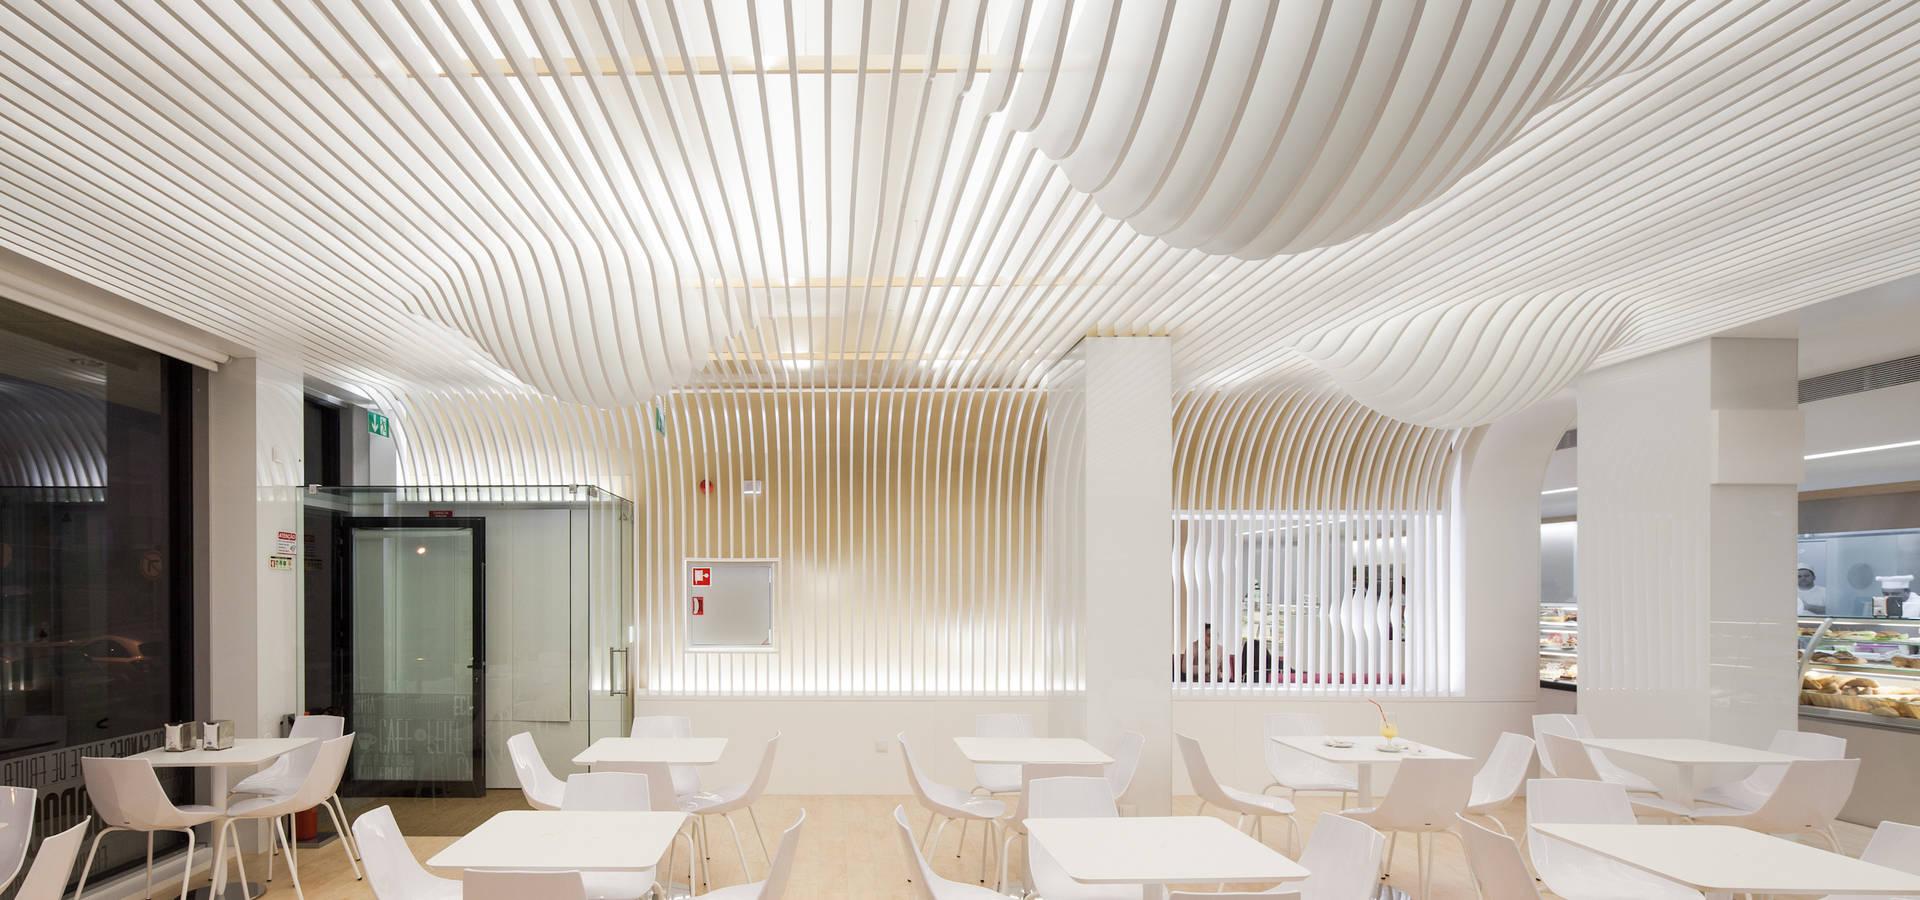 PAULO MERLINI ARCHITECTS